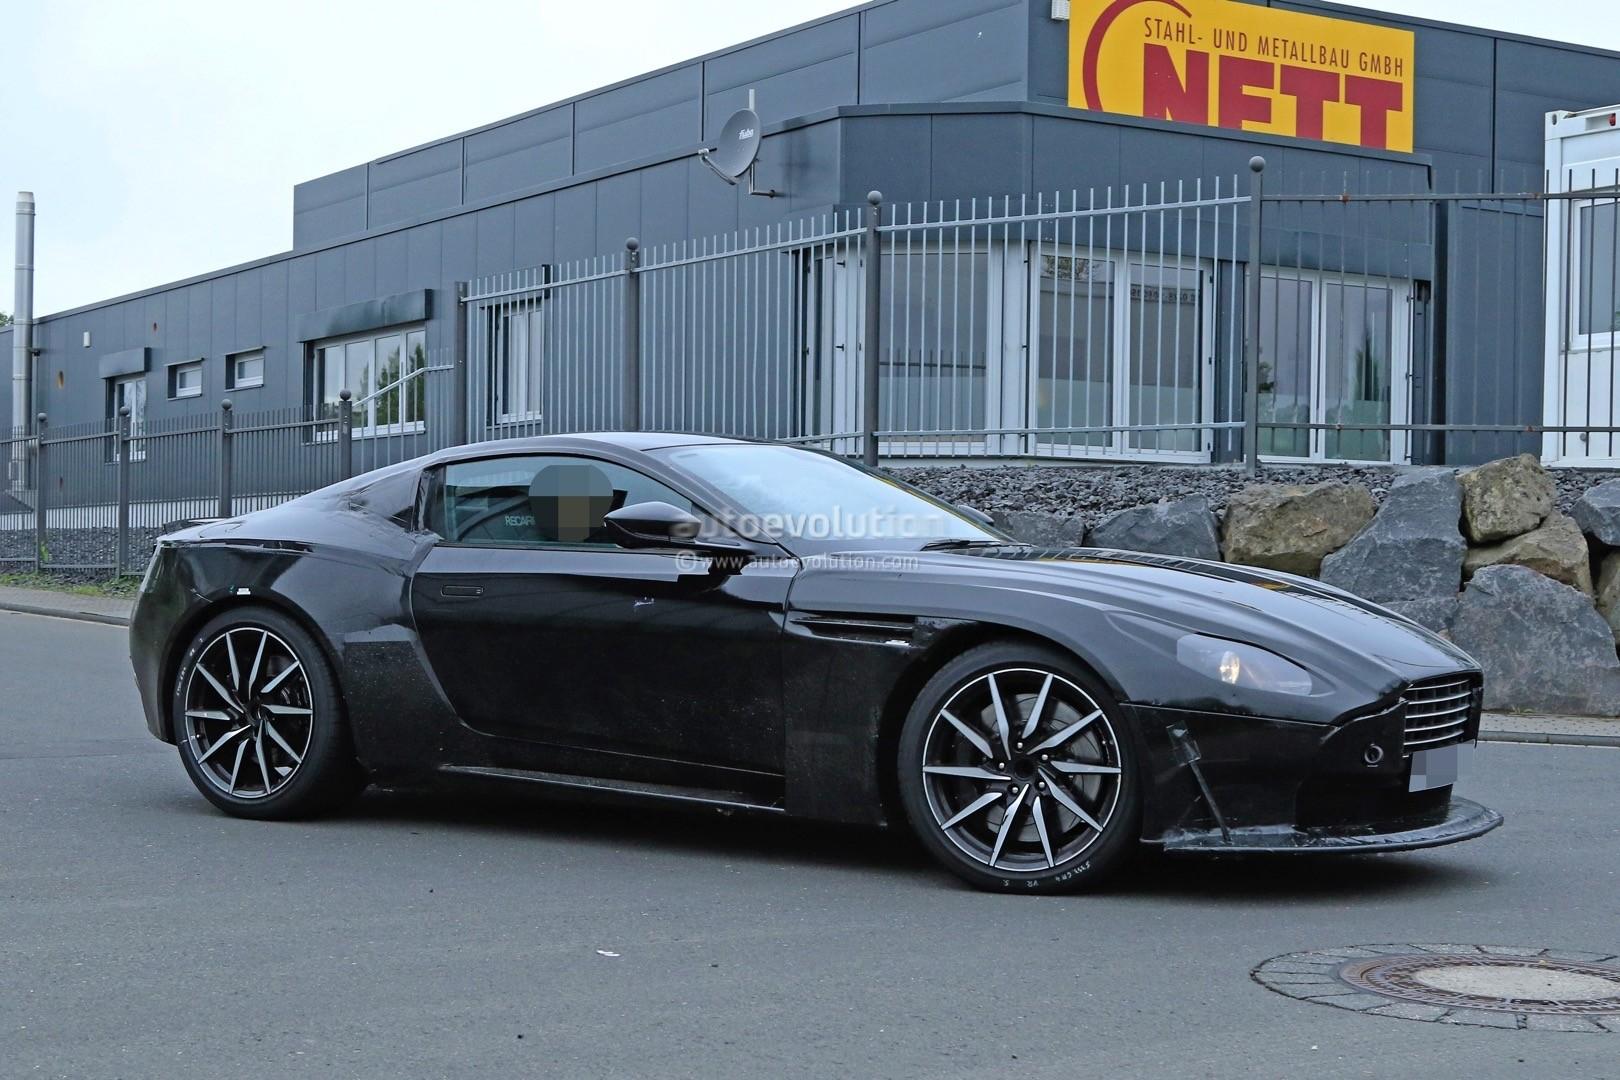 2018 Aston Martin V8 Vantage 2018 Aston Martin V8 Vantage ...